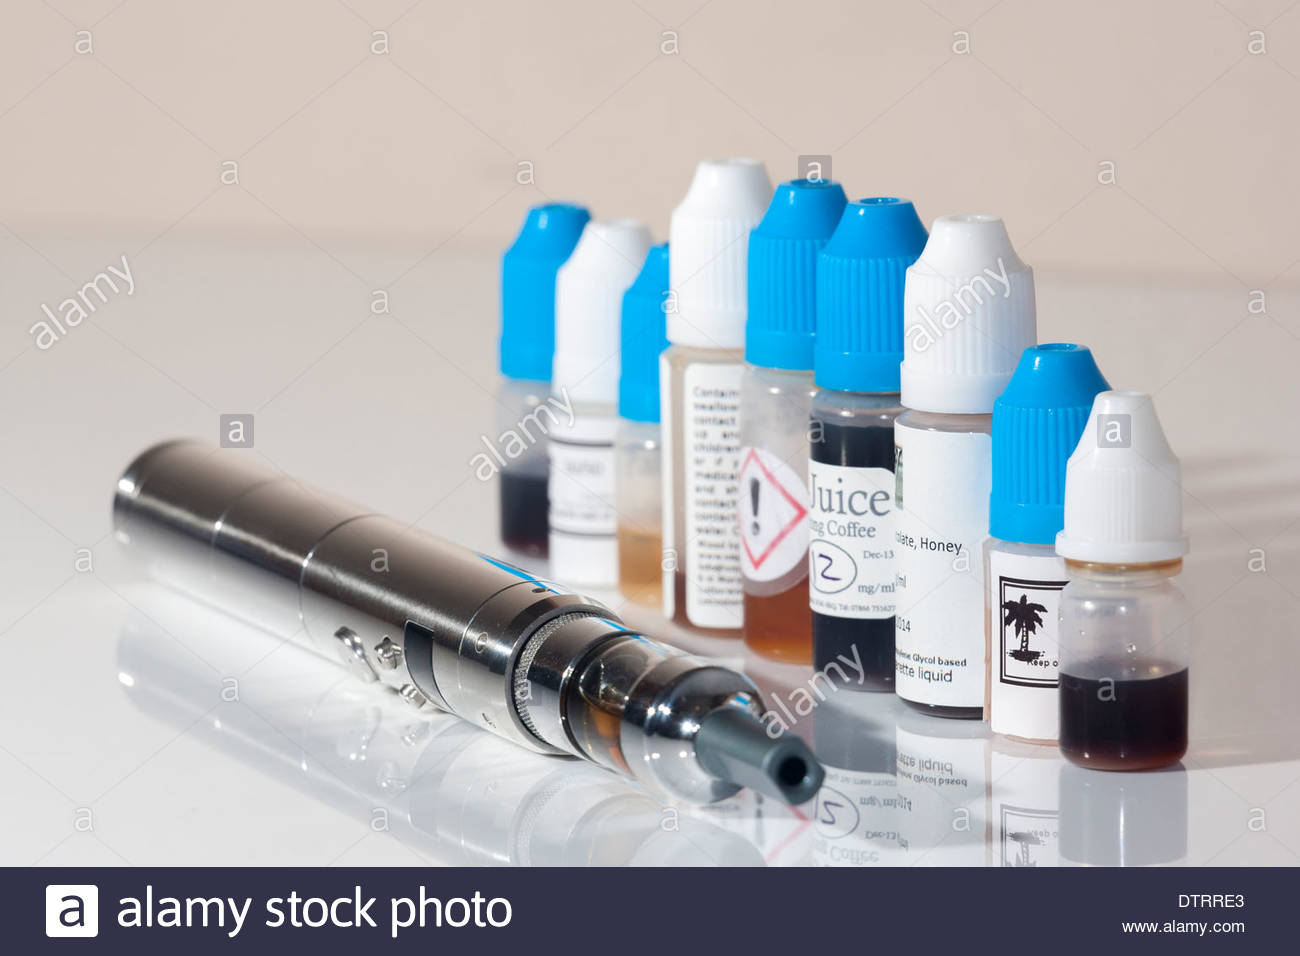 Personal Vaporizer (e-cigarette) and e-juice - Stock Image